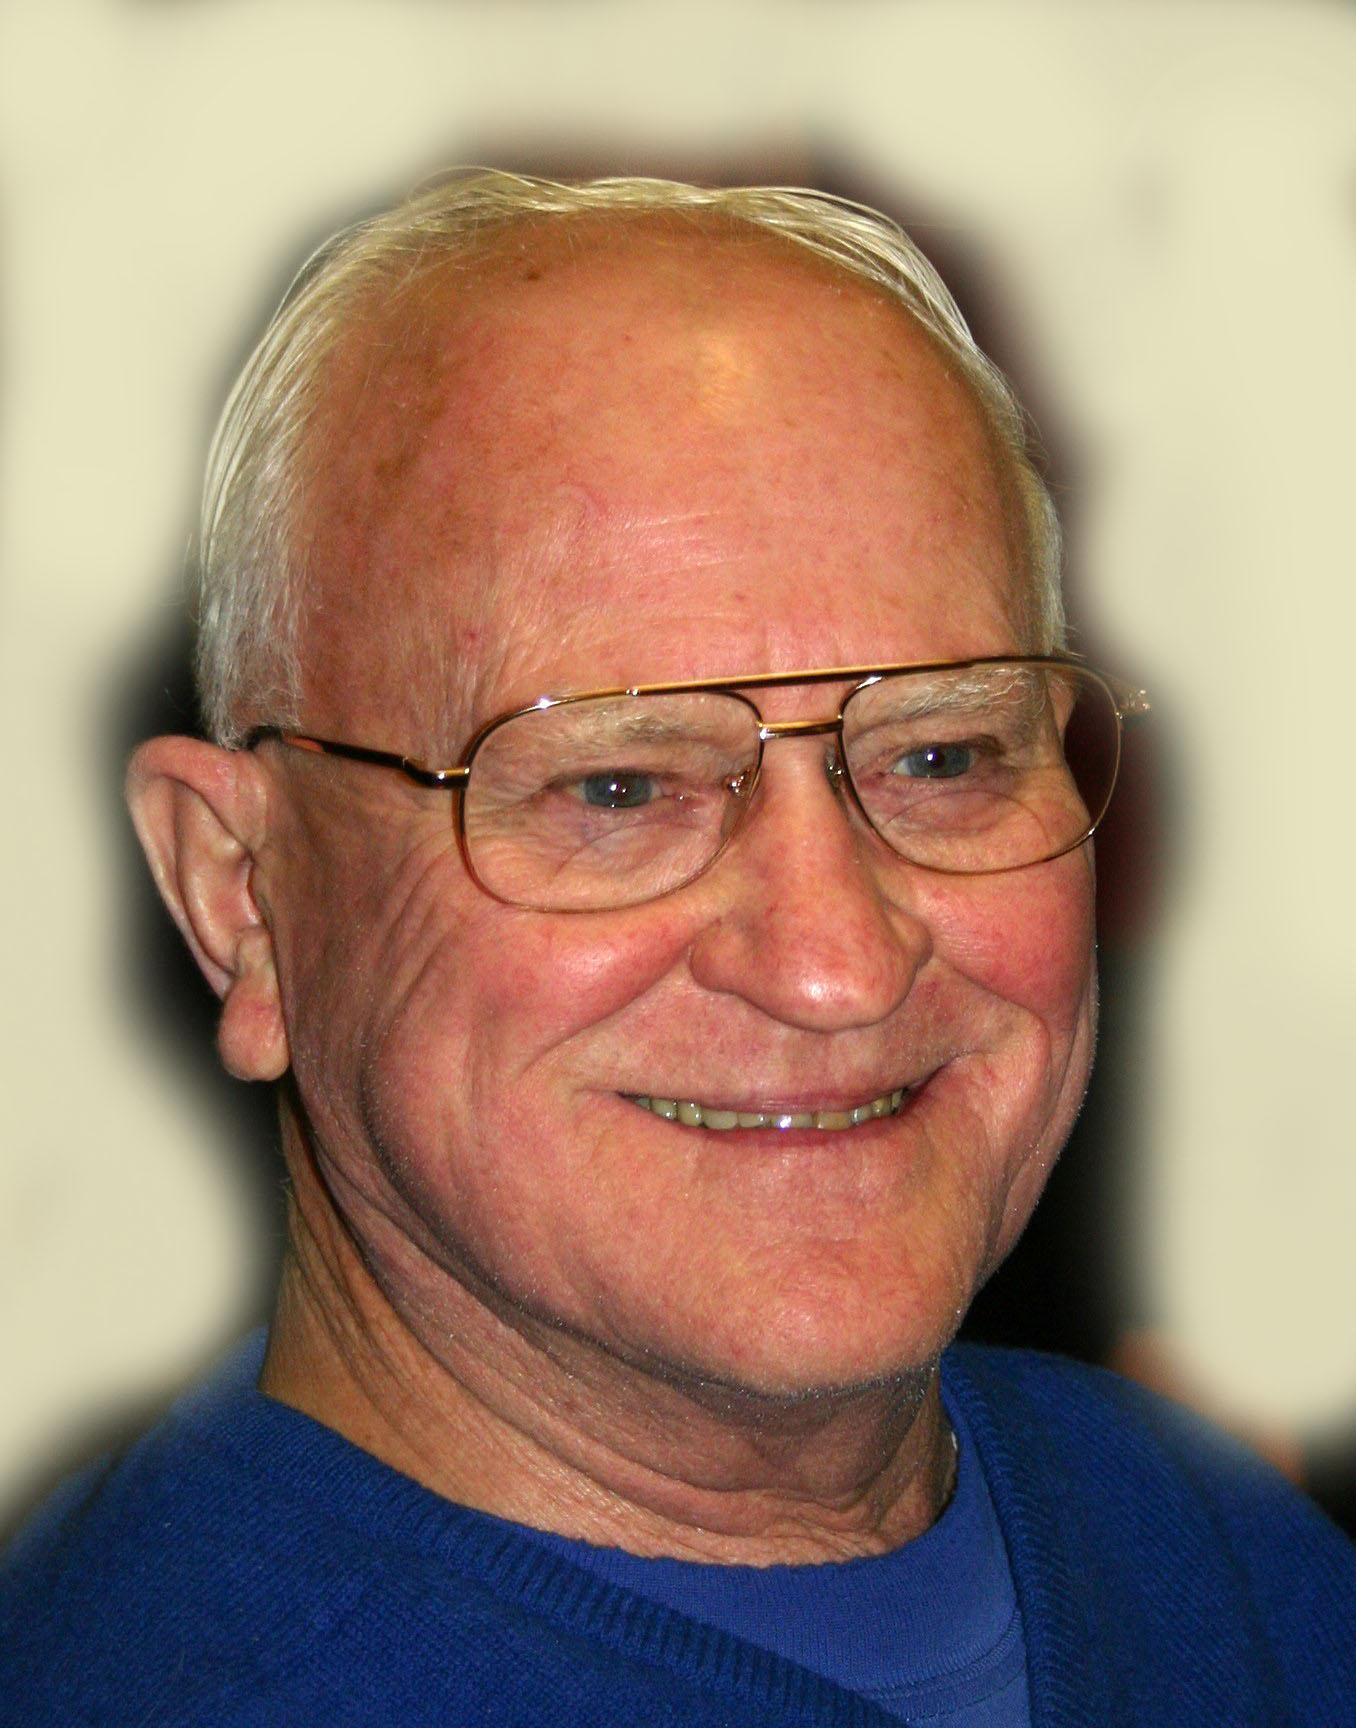 B1 - John Wenmoth